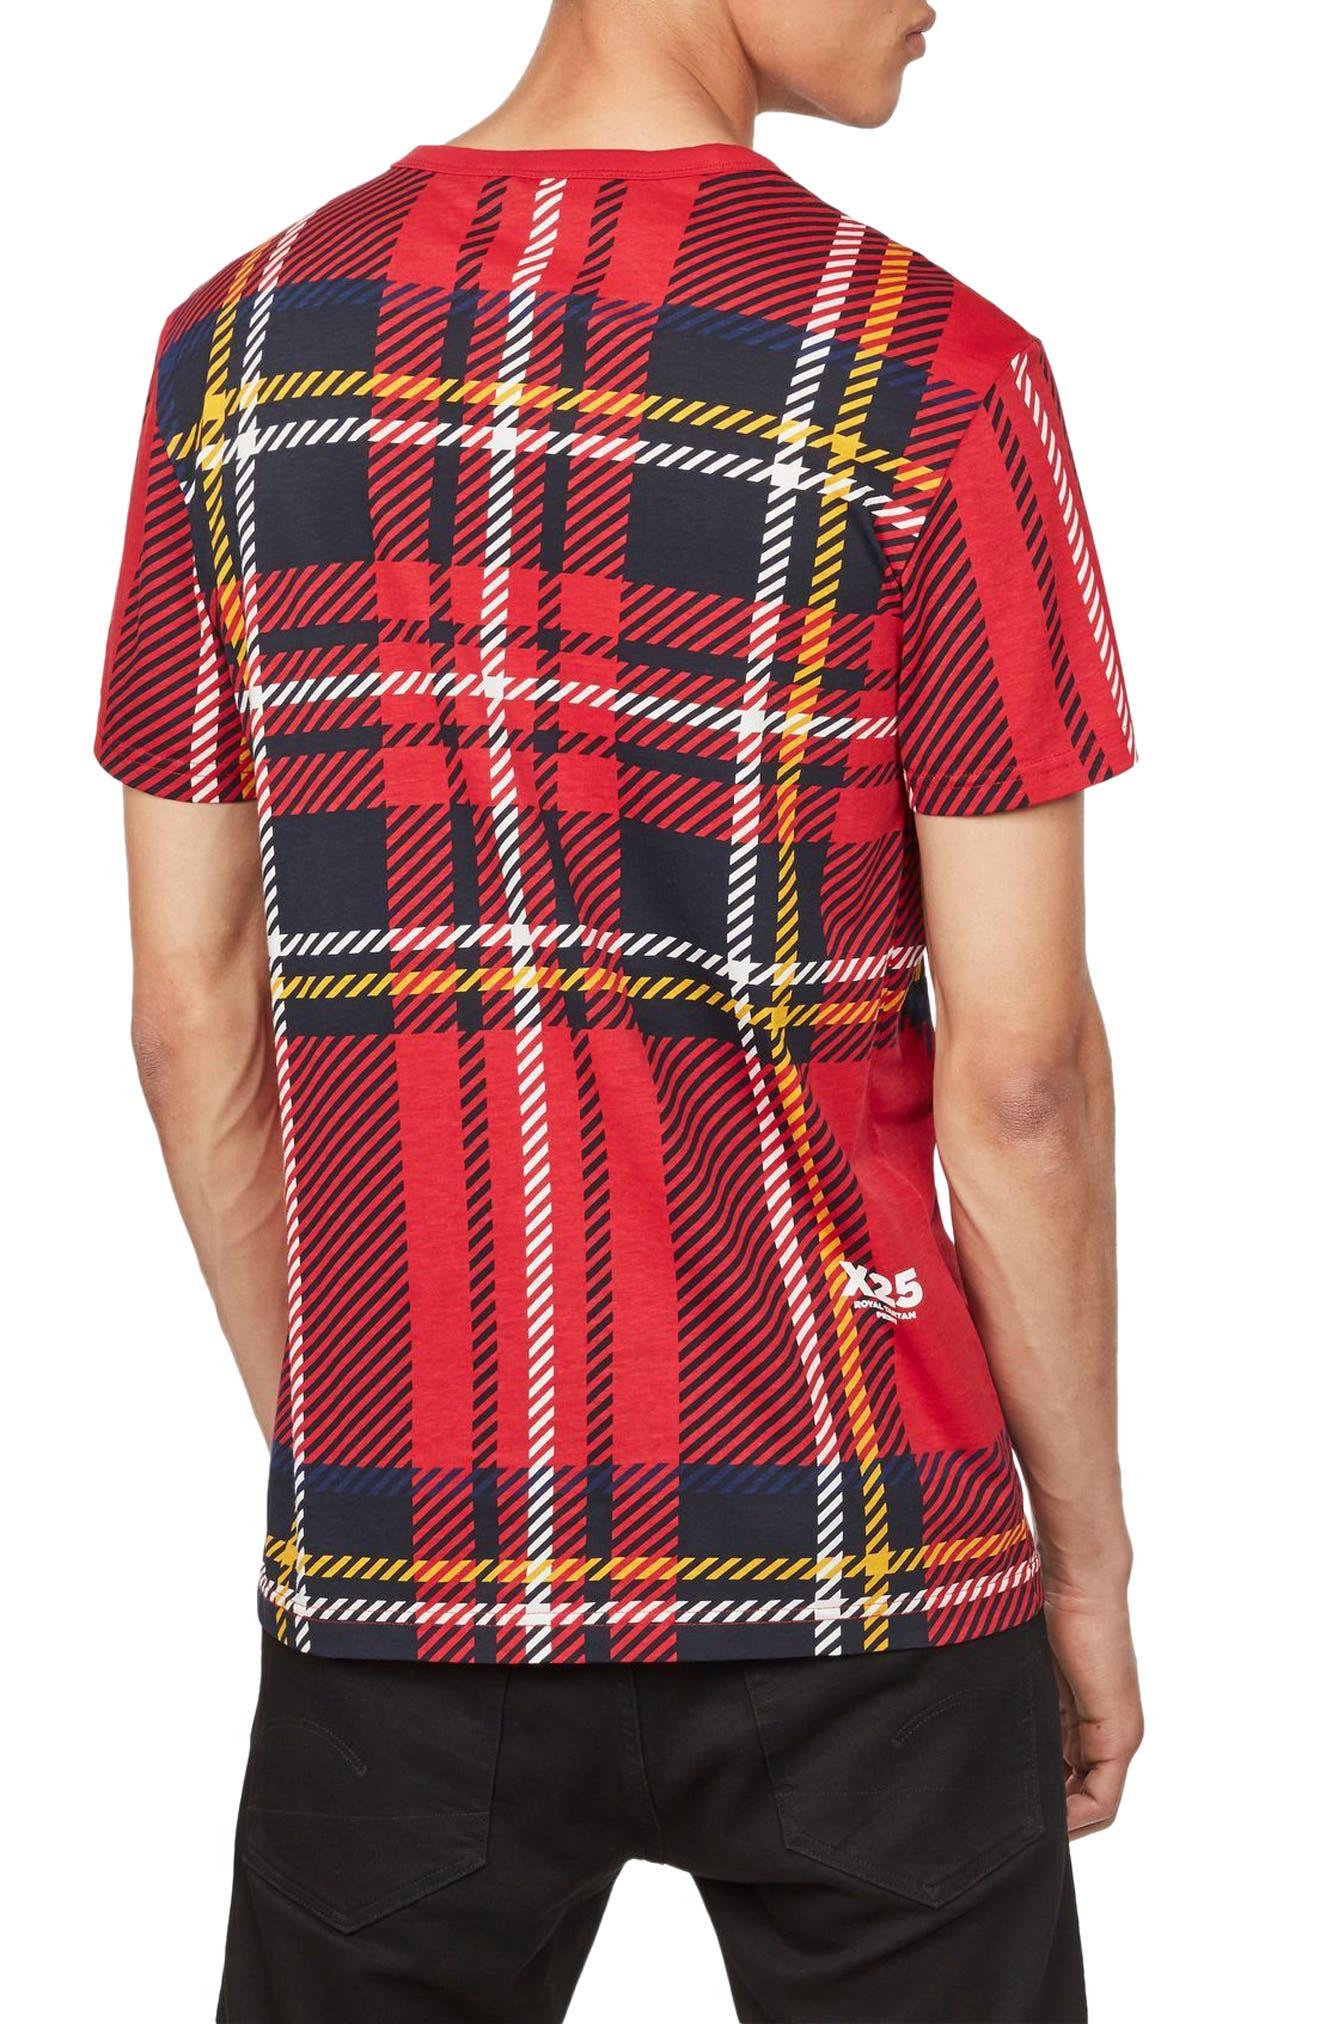 Alternate Image 2  - G-Star Raw Royal Tartan Graphic T-Shirt